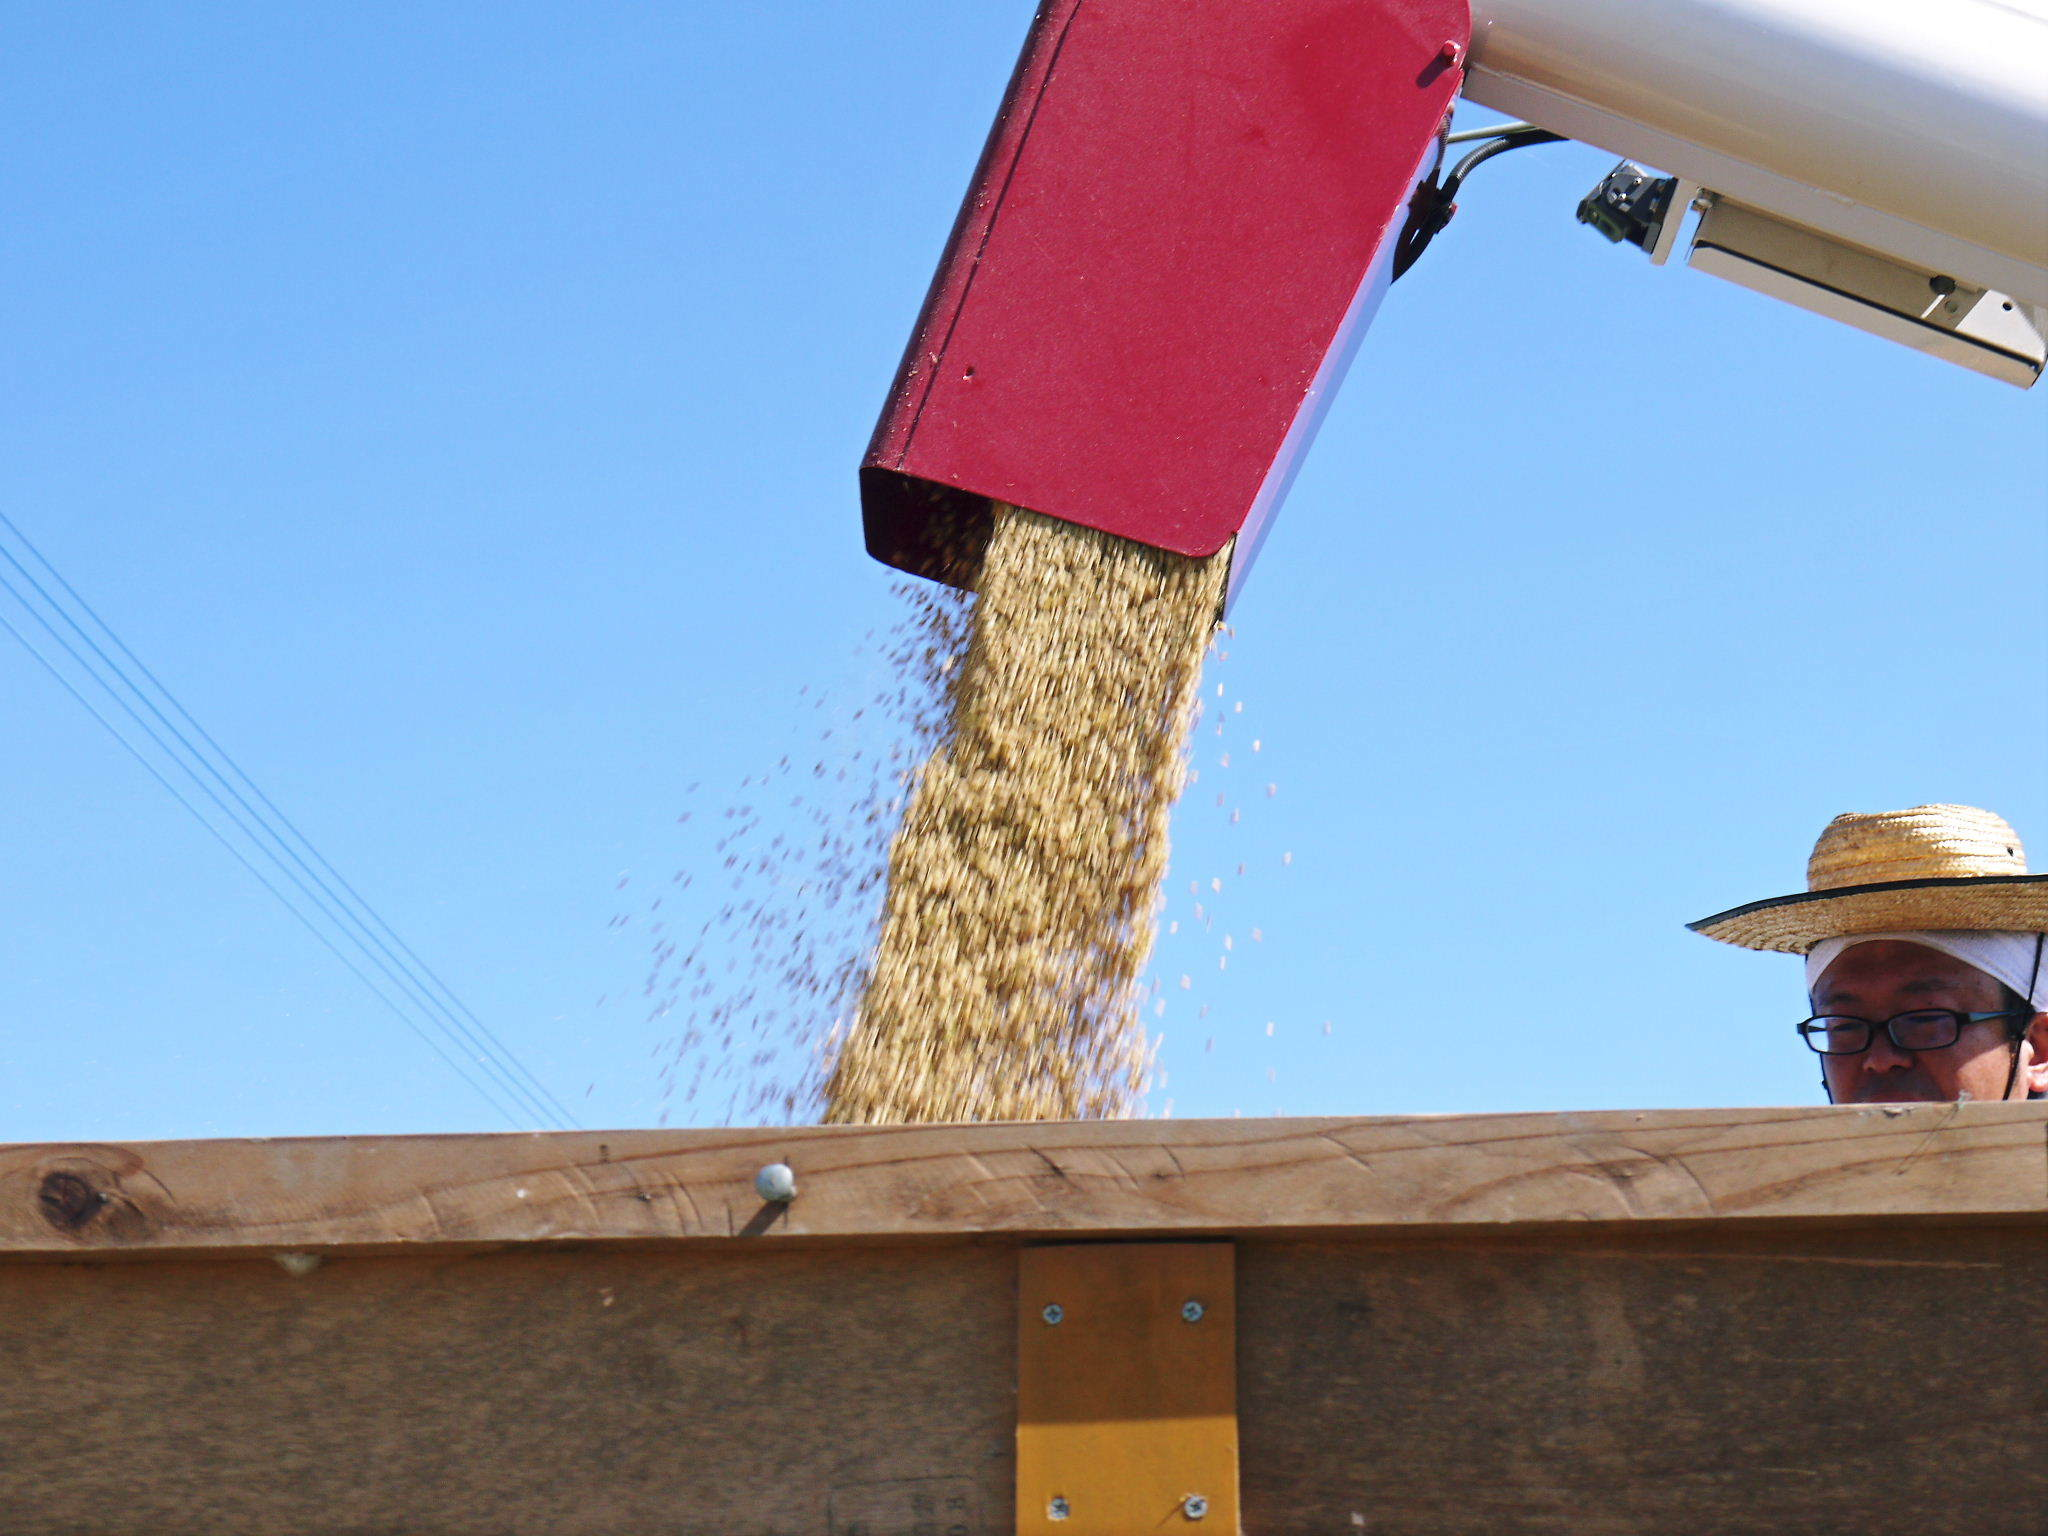 無農薬の『雑穀米』『発芽玄米』『米粉(微細粒米粉)』大好評販売中 稲刈りの様子を現地取材(2021)_a0254656_18572958.jpg